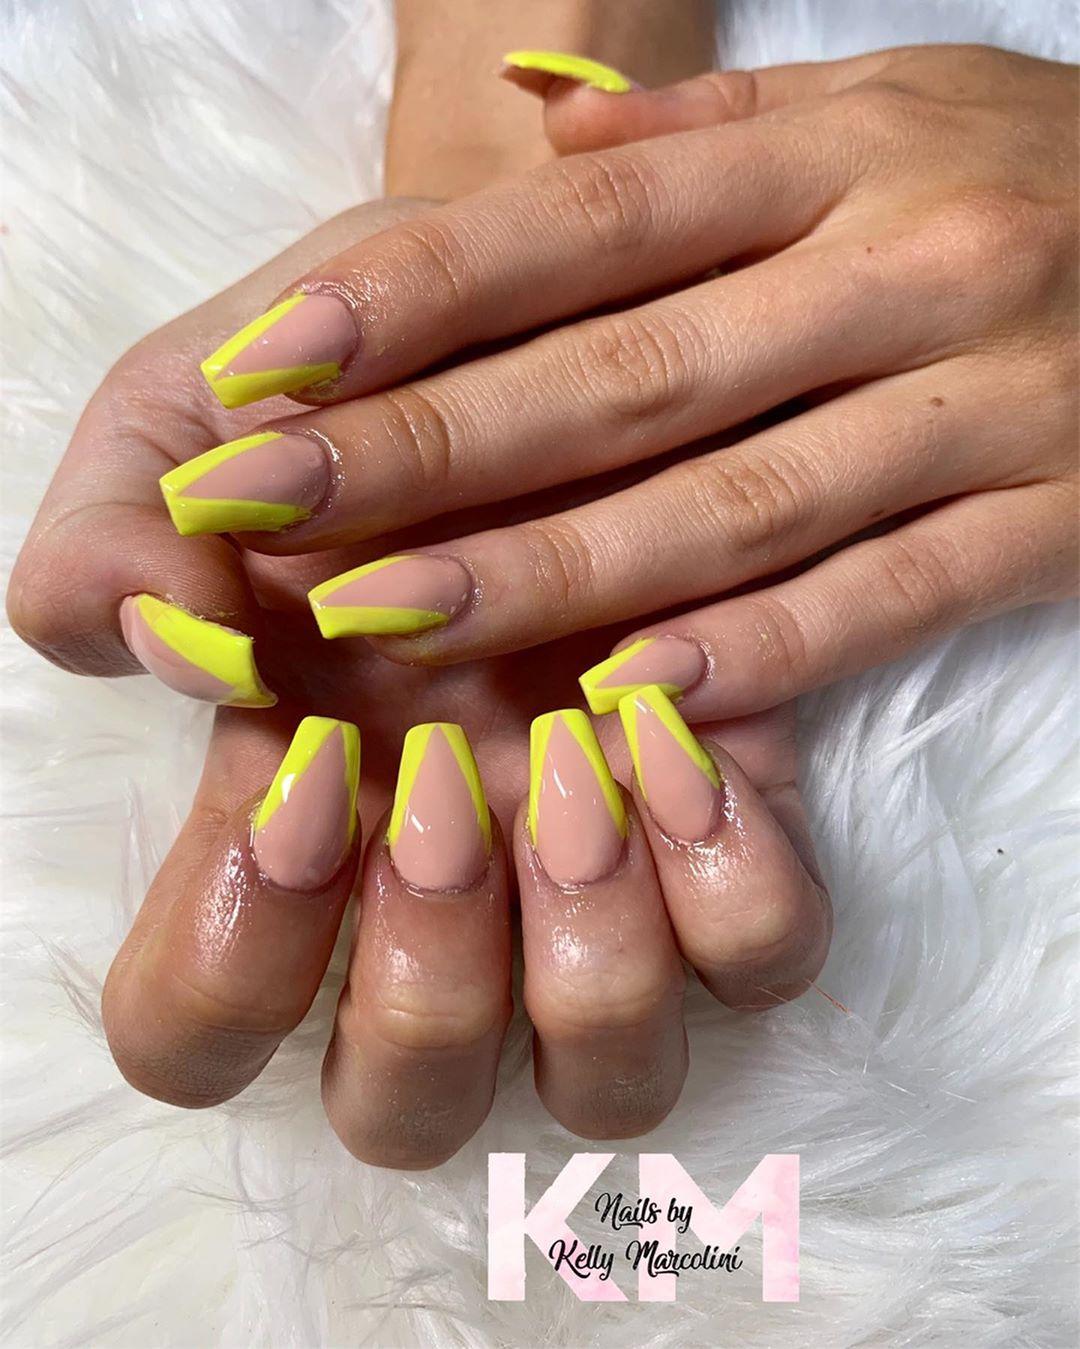 Yellow Acrylic Nails with V-shaped tips